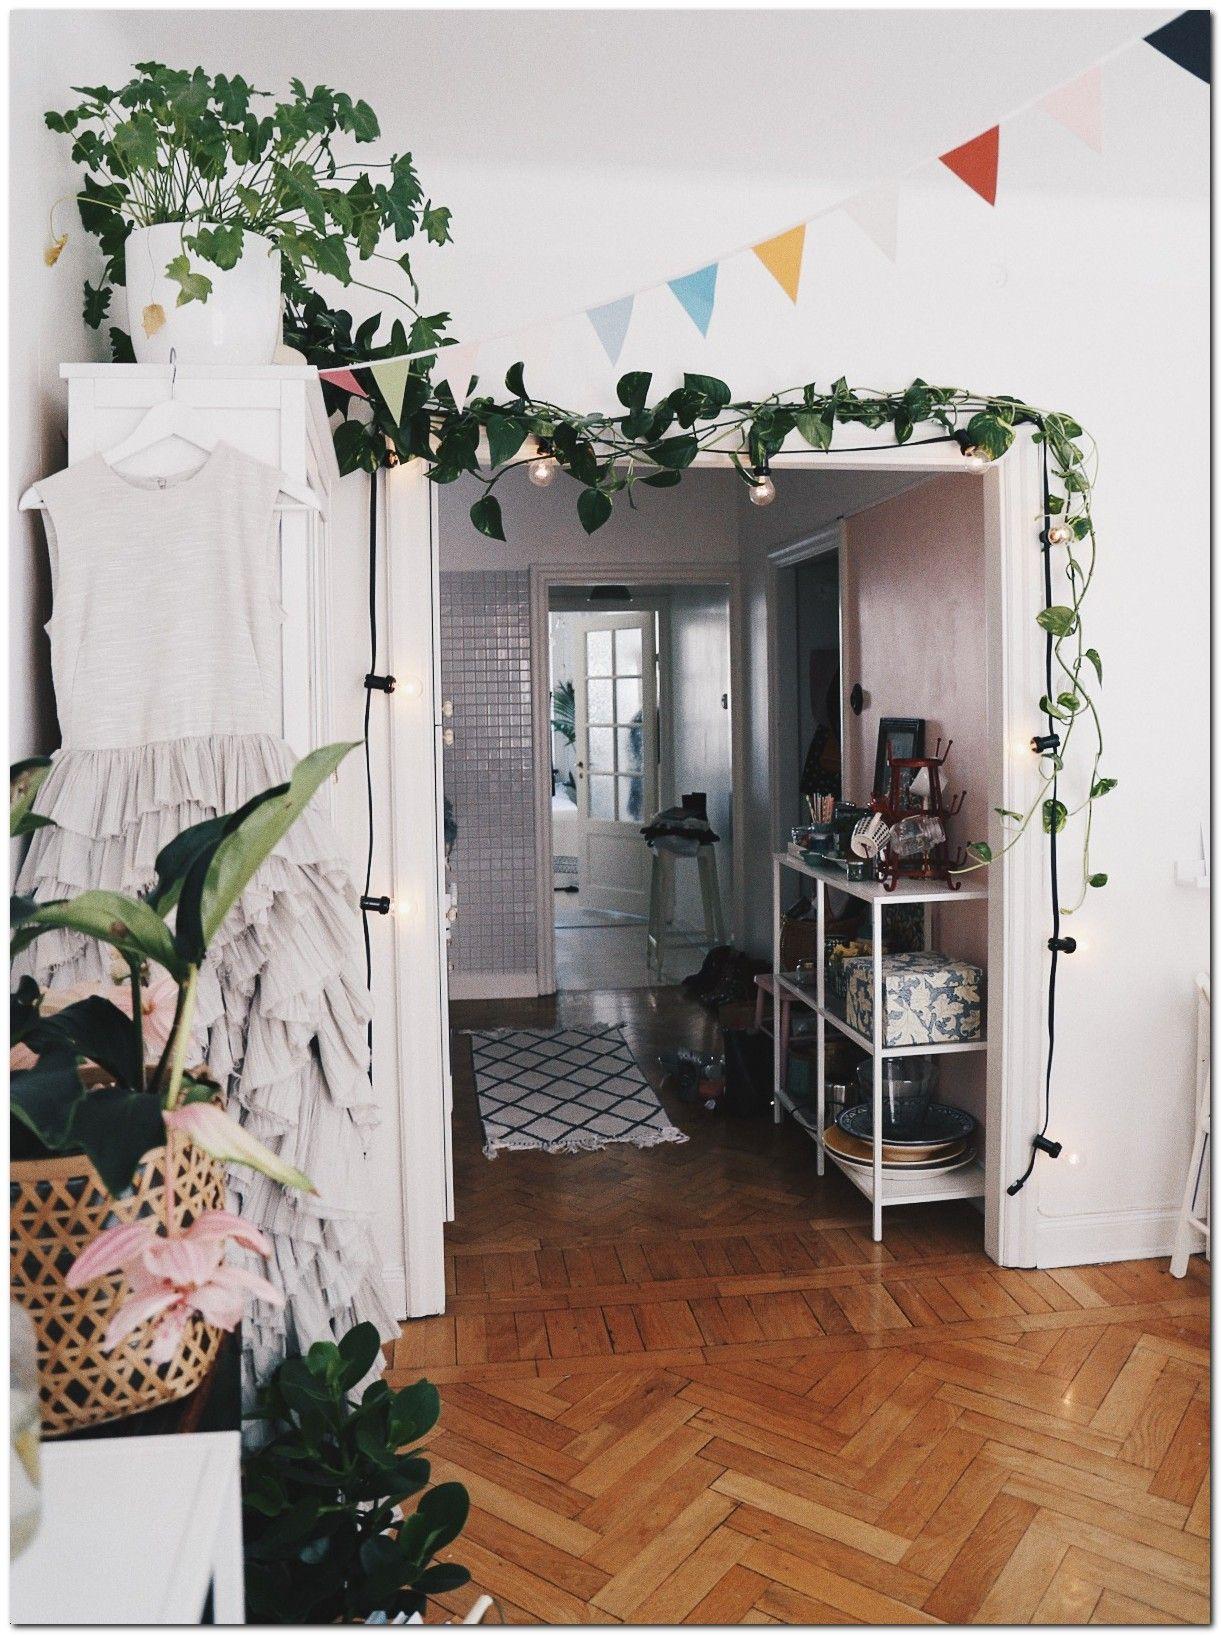 90 Quirky Decor Ideas To Make Your Home Unique